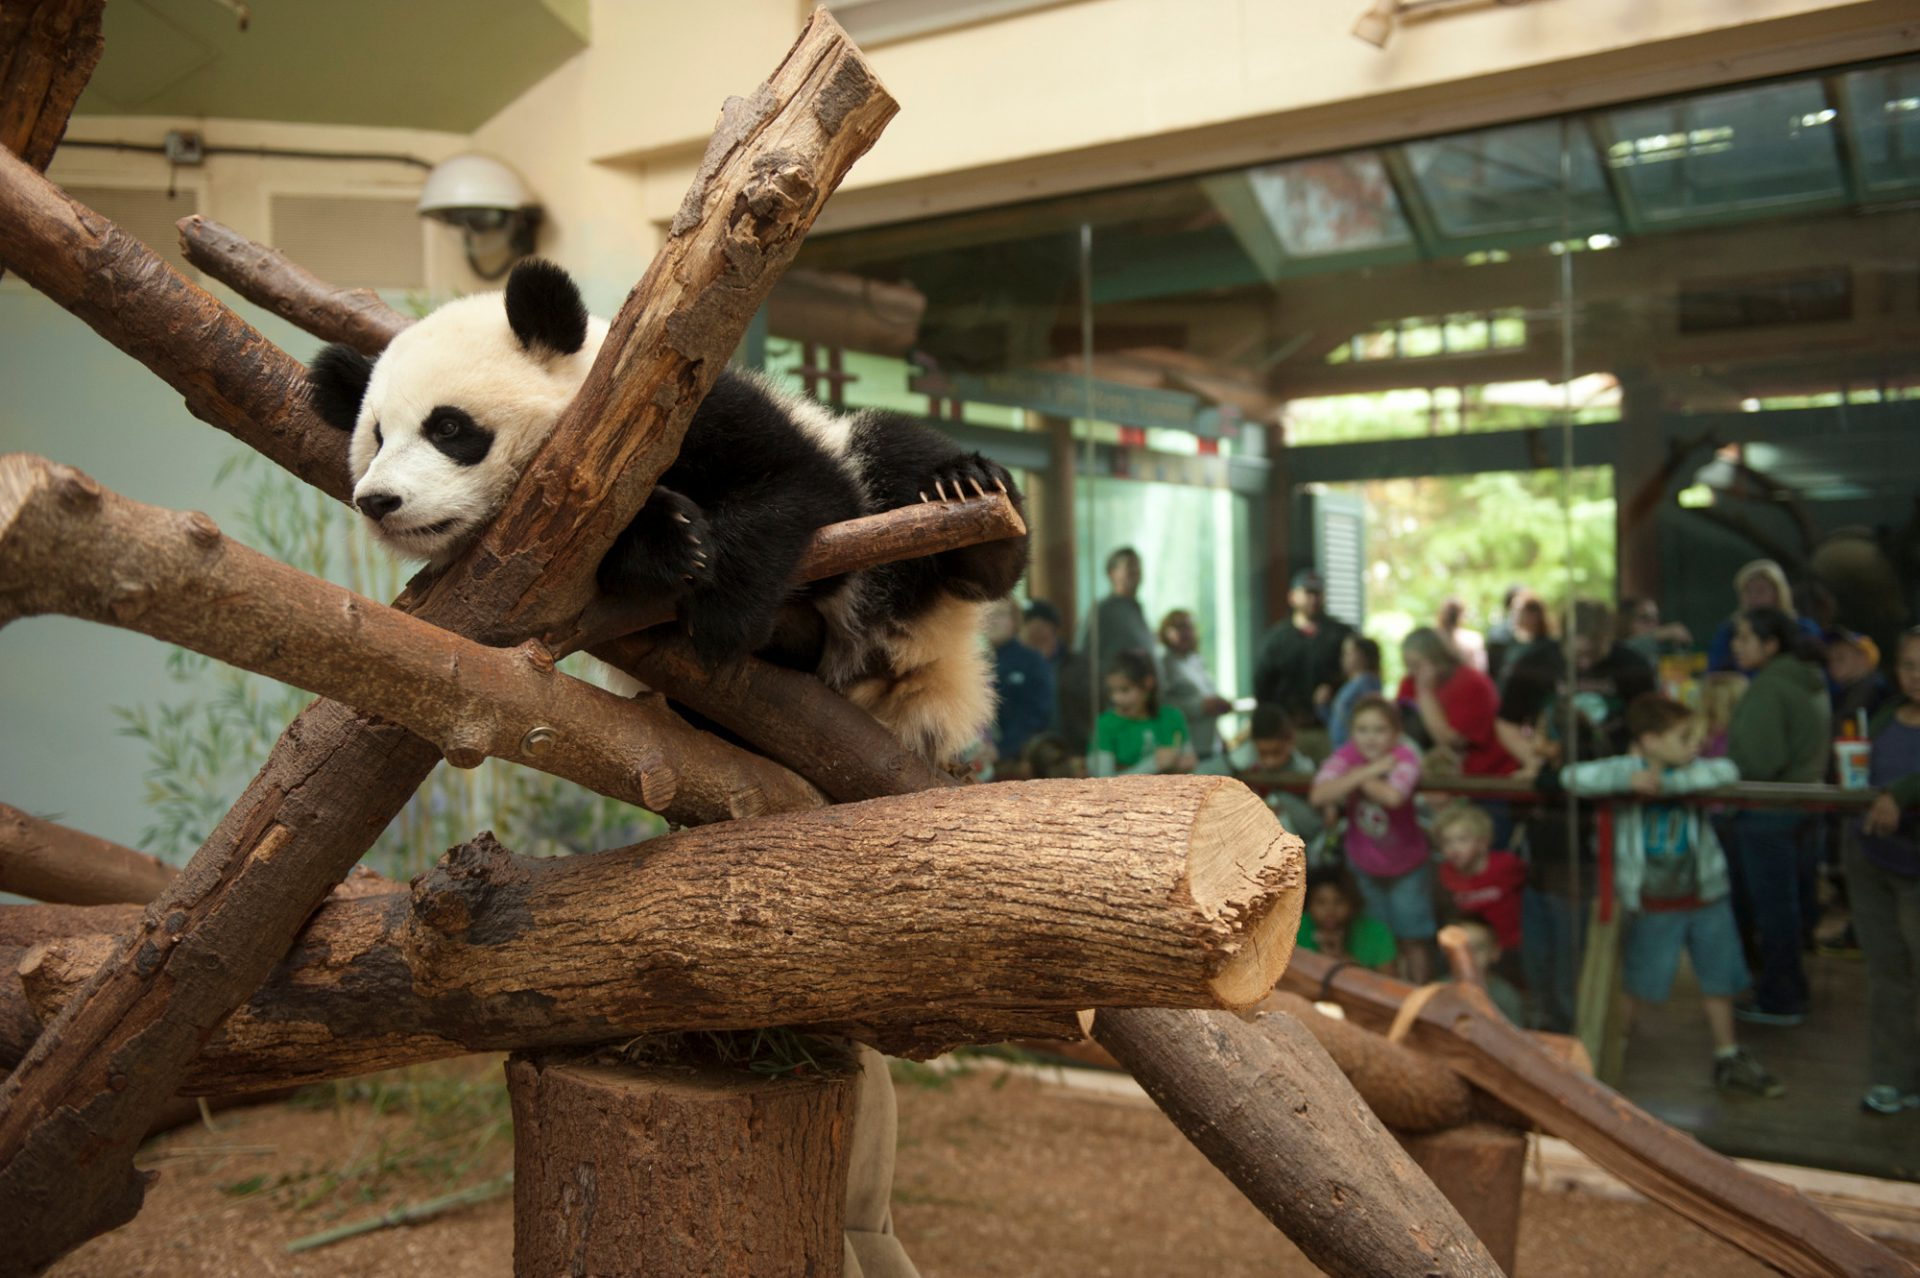 An endangered (IUCN) and federally endangered giant panda (Ailuropoda melanoleuca) at Zoo Atlanta.